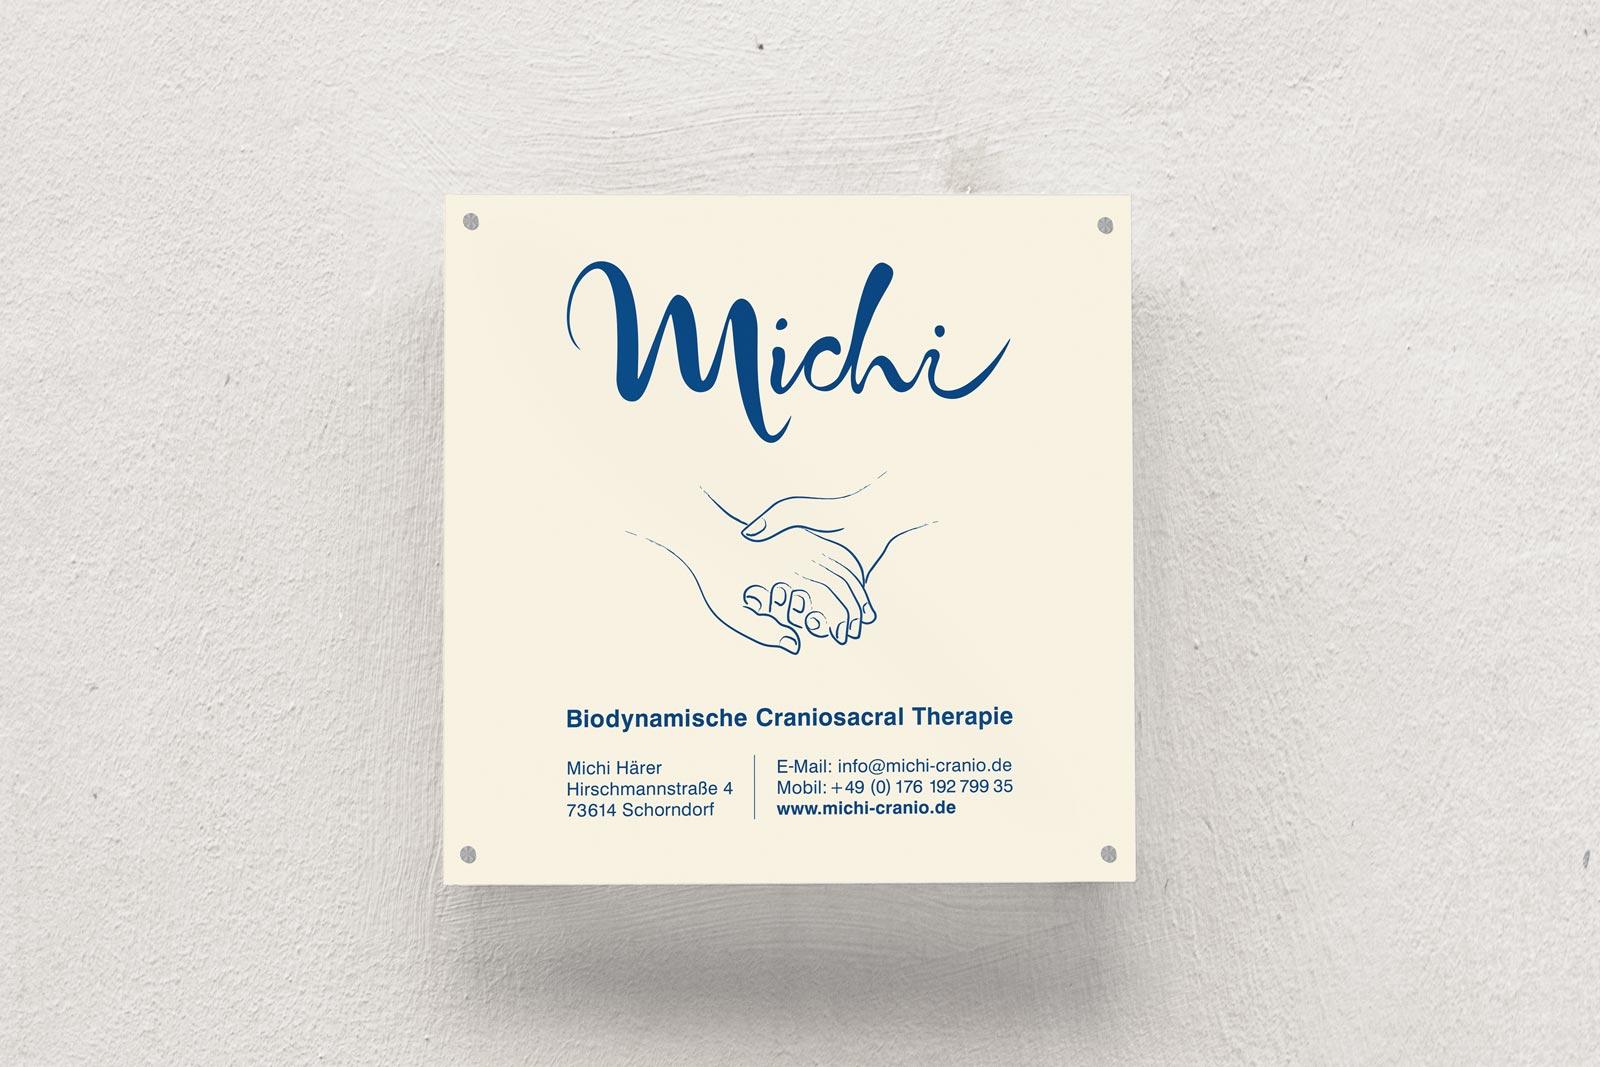 Michi, Craniosacral Therapie, Schild, Praxisschild, Corporate Design